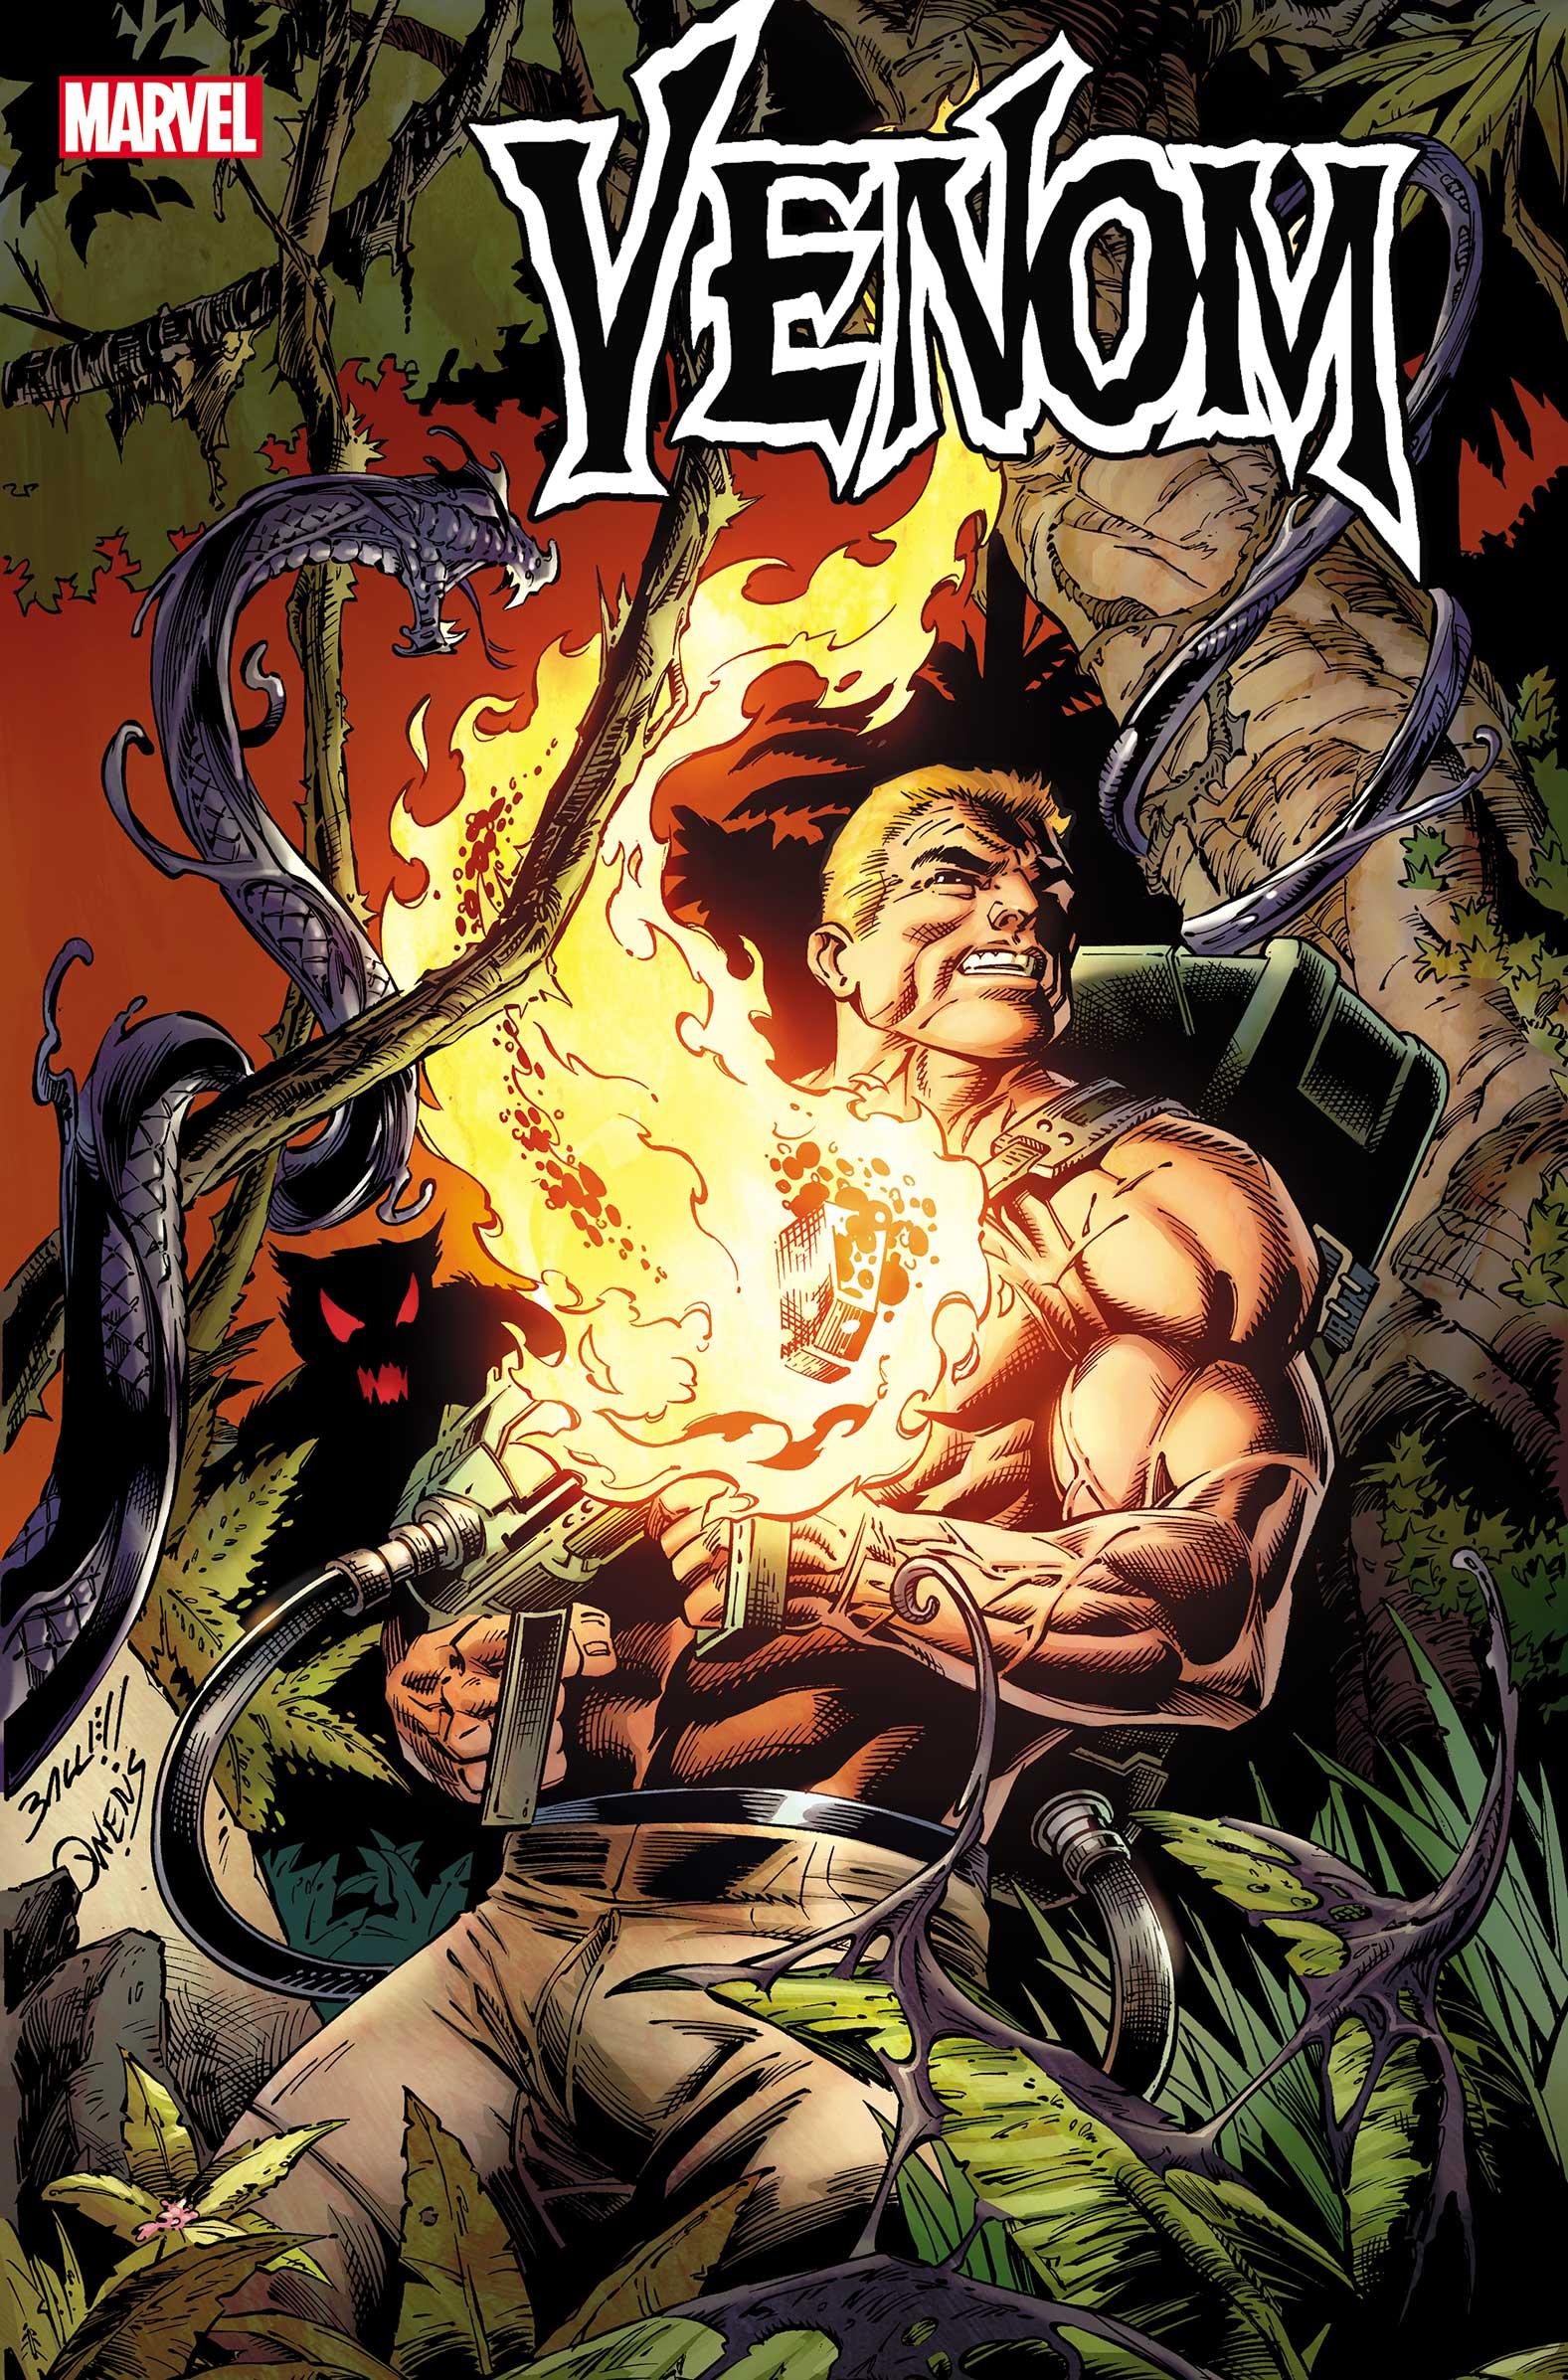 Venom (2018) #23